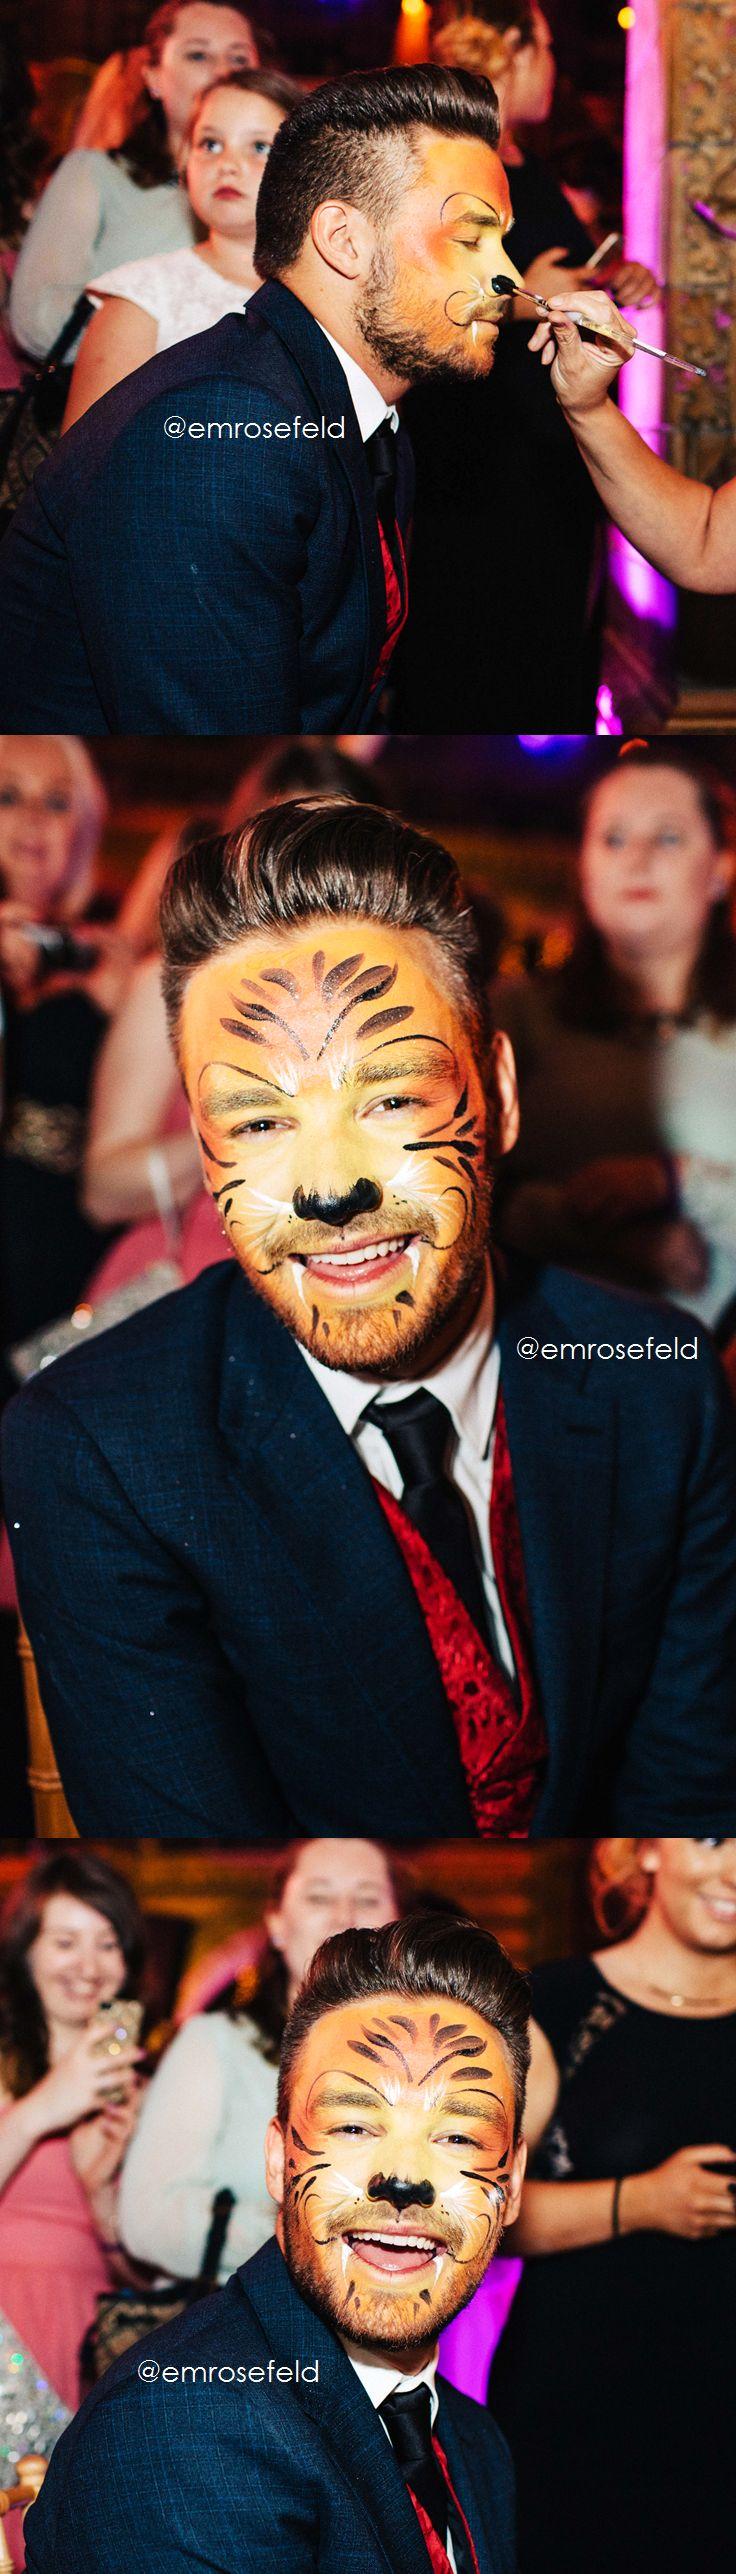 Liam Payne   at the Believe in Magic Cinderella Ball 8.10.15   @emrosefeld  